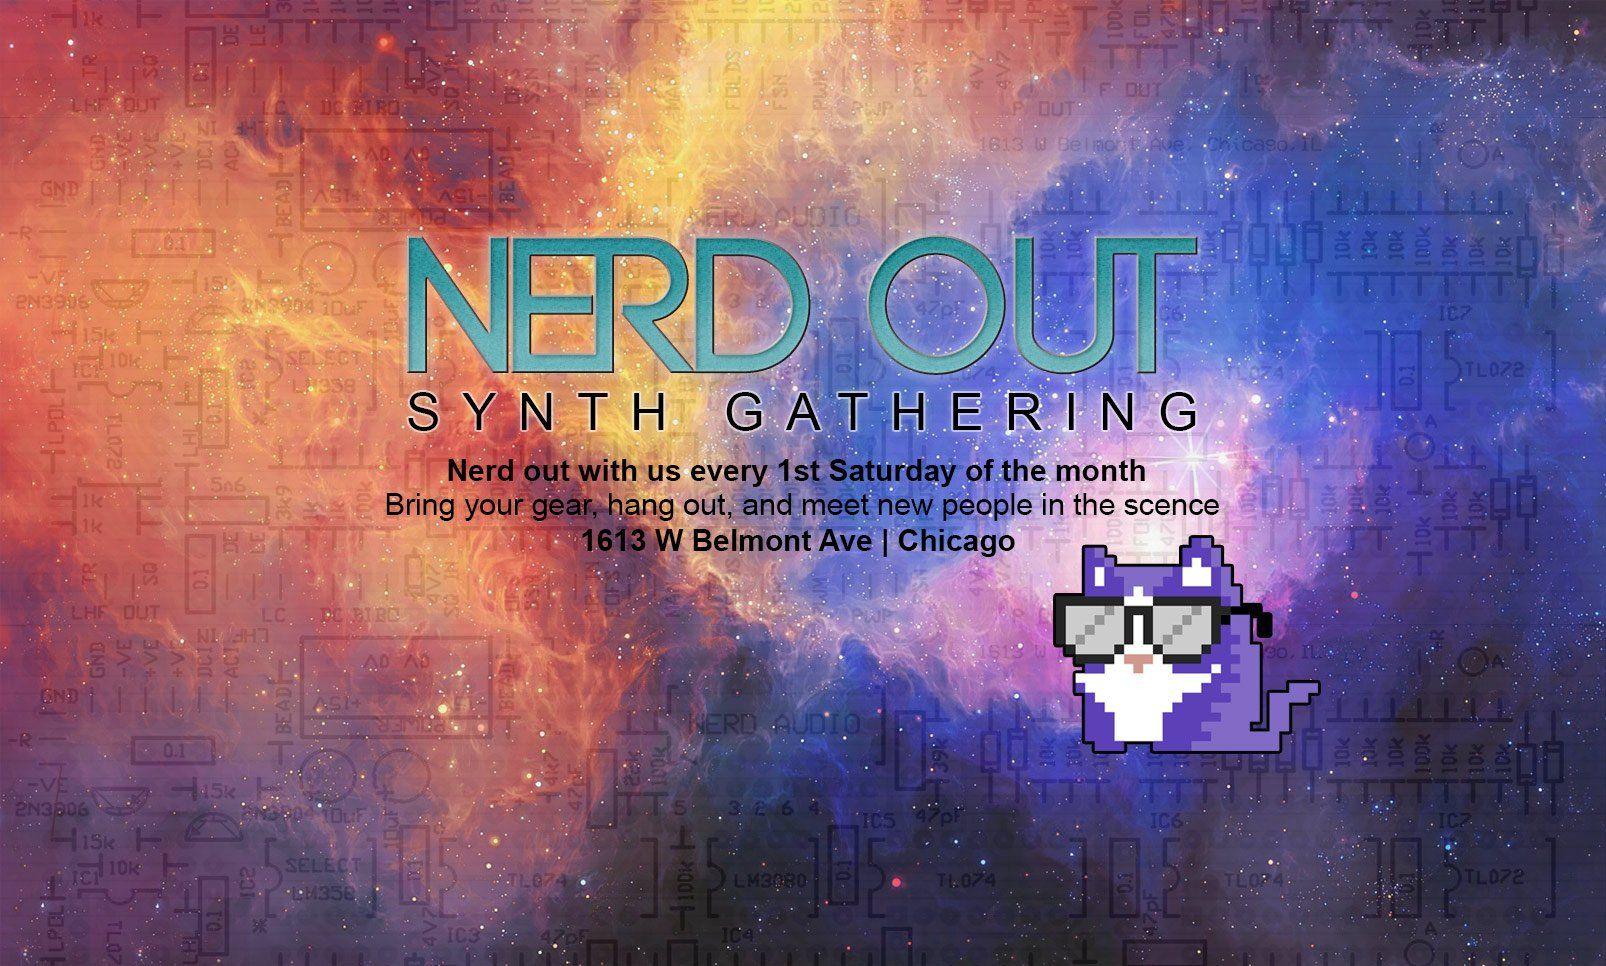 Nerd Audio is a store specializing in Eurorack Modular